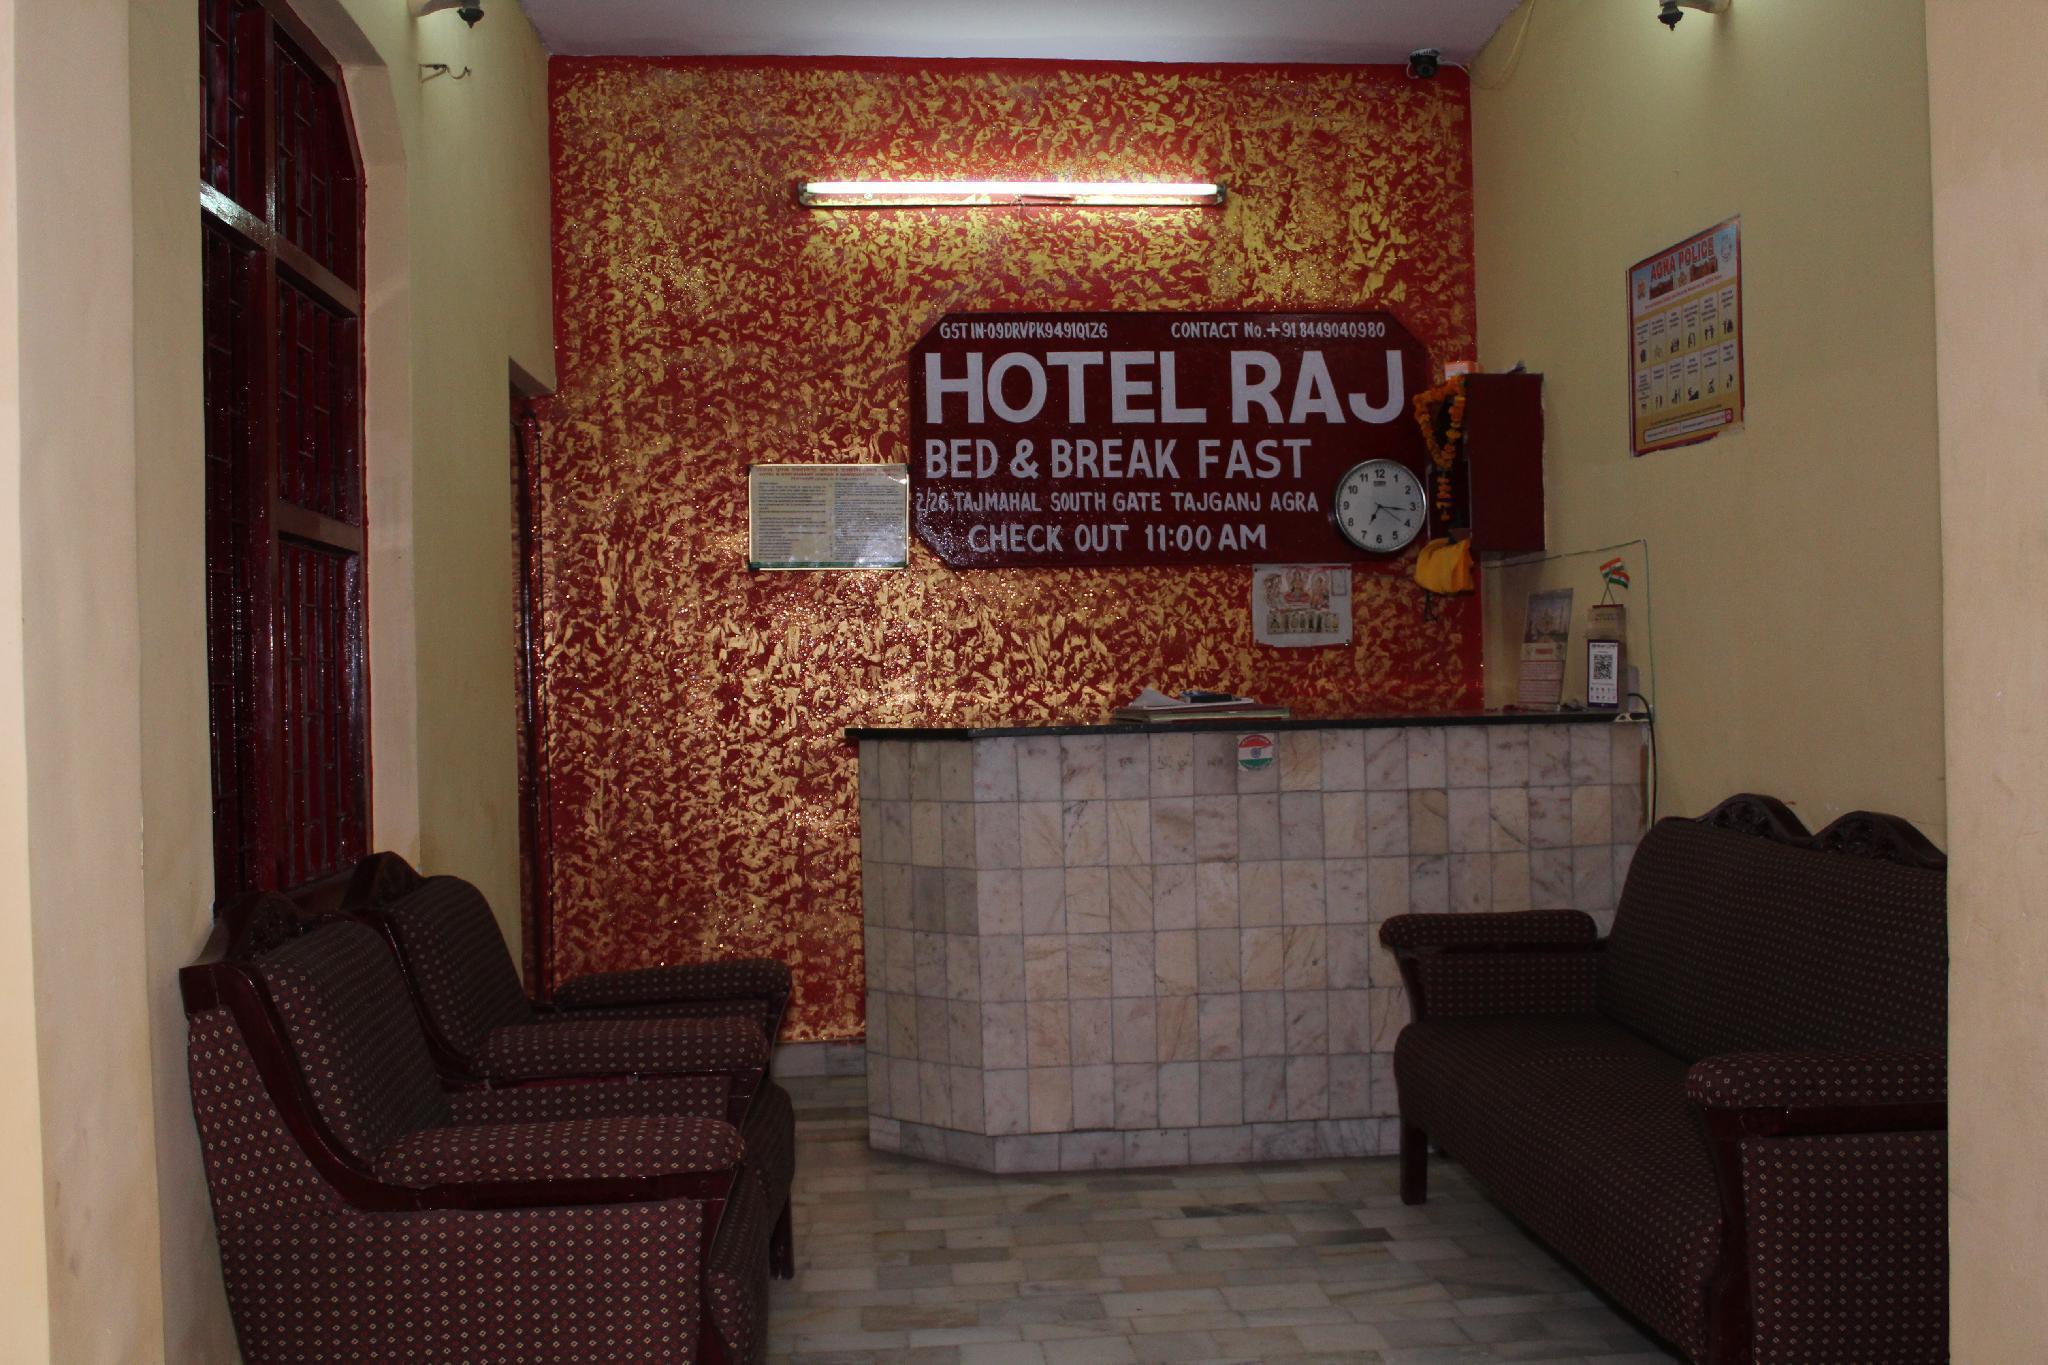 Hotel Raj Bed And Breakfast